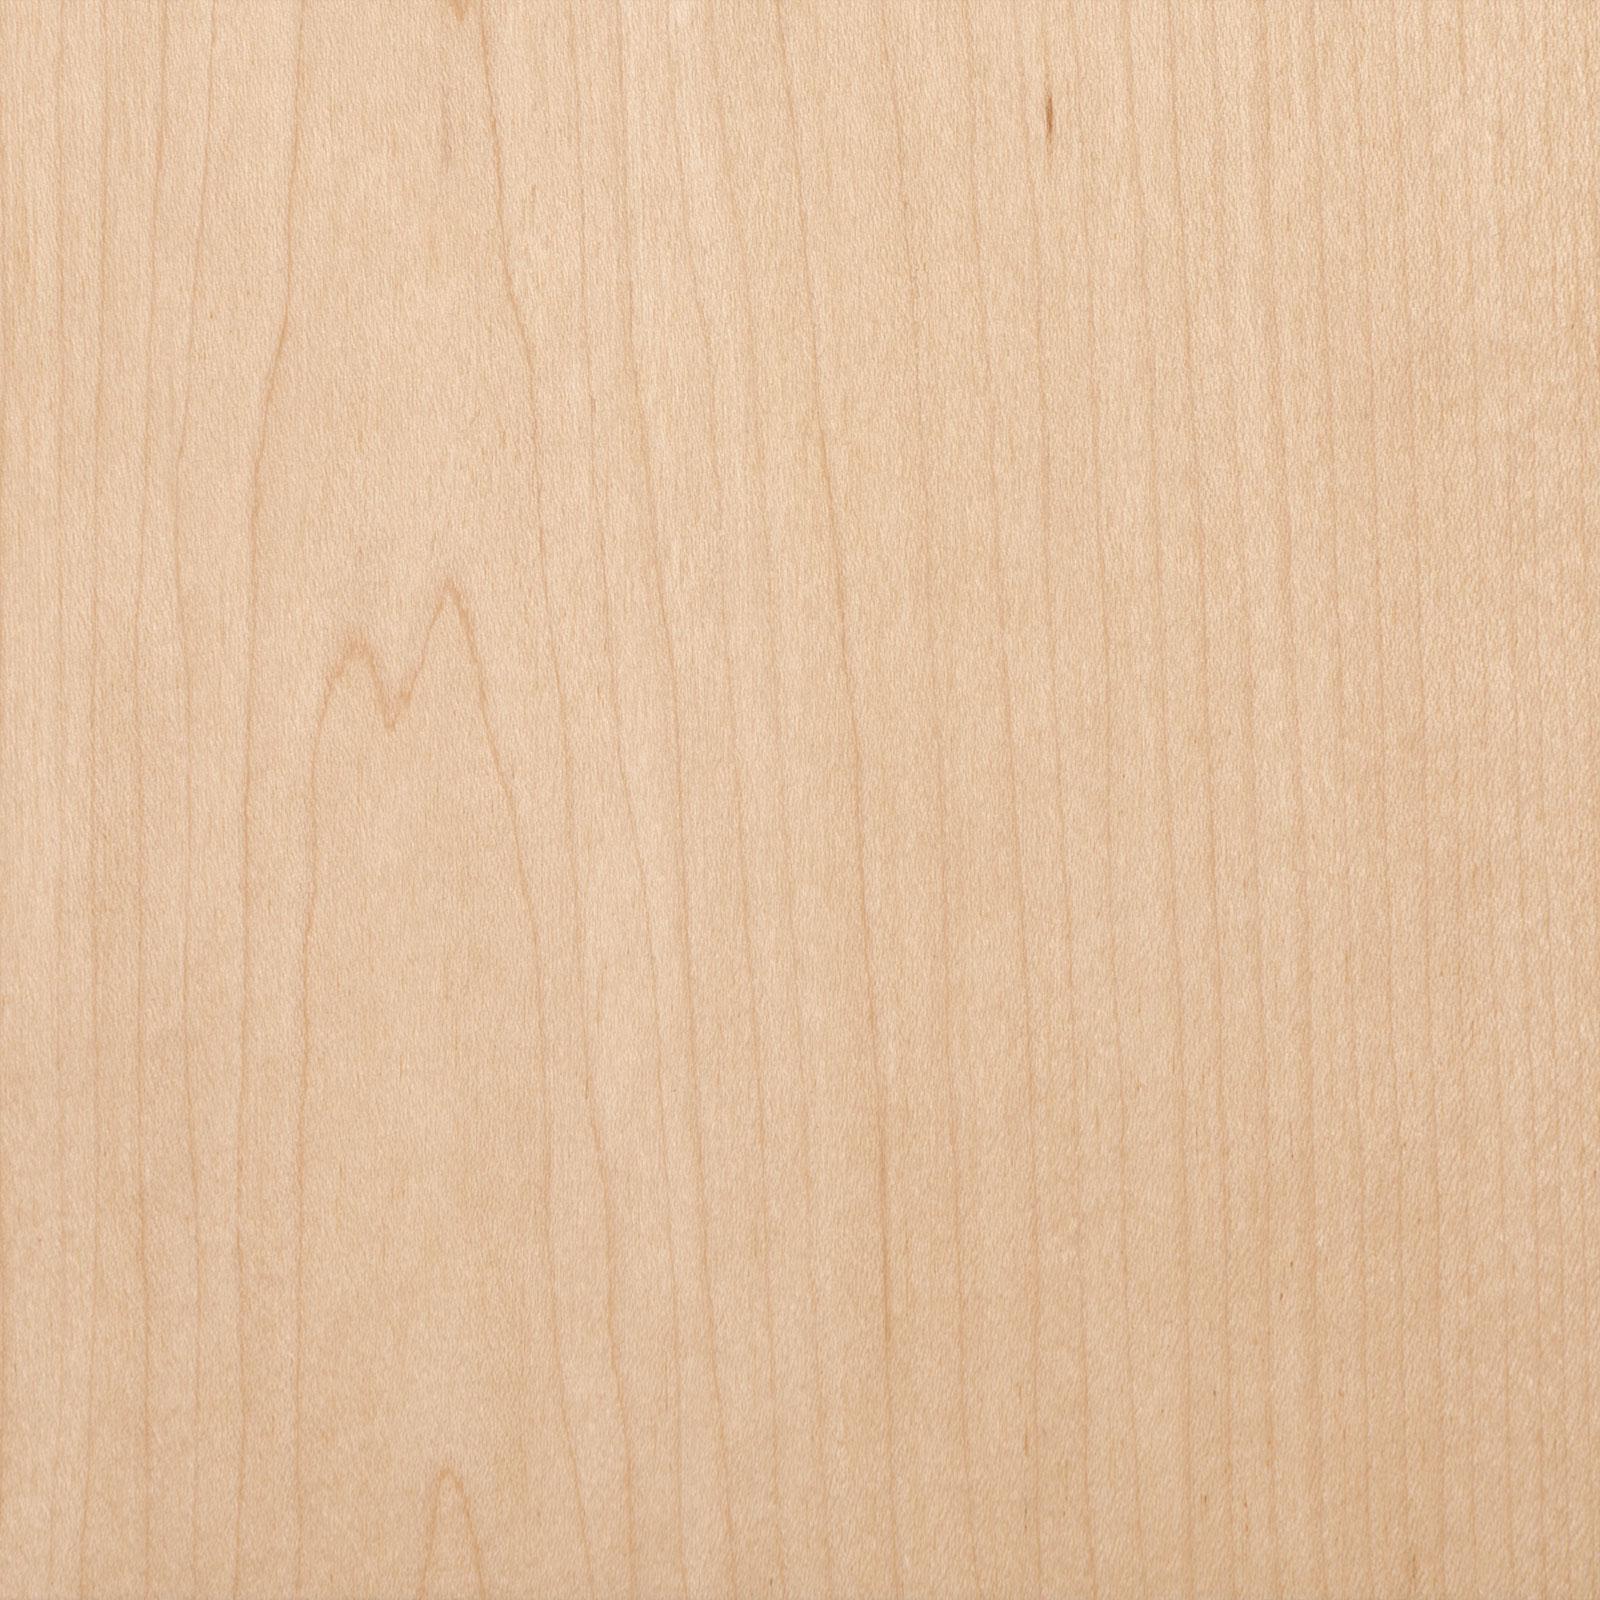 Sugar Maple Wood ~ White maple trustile doors